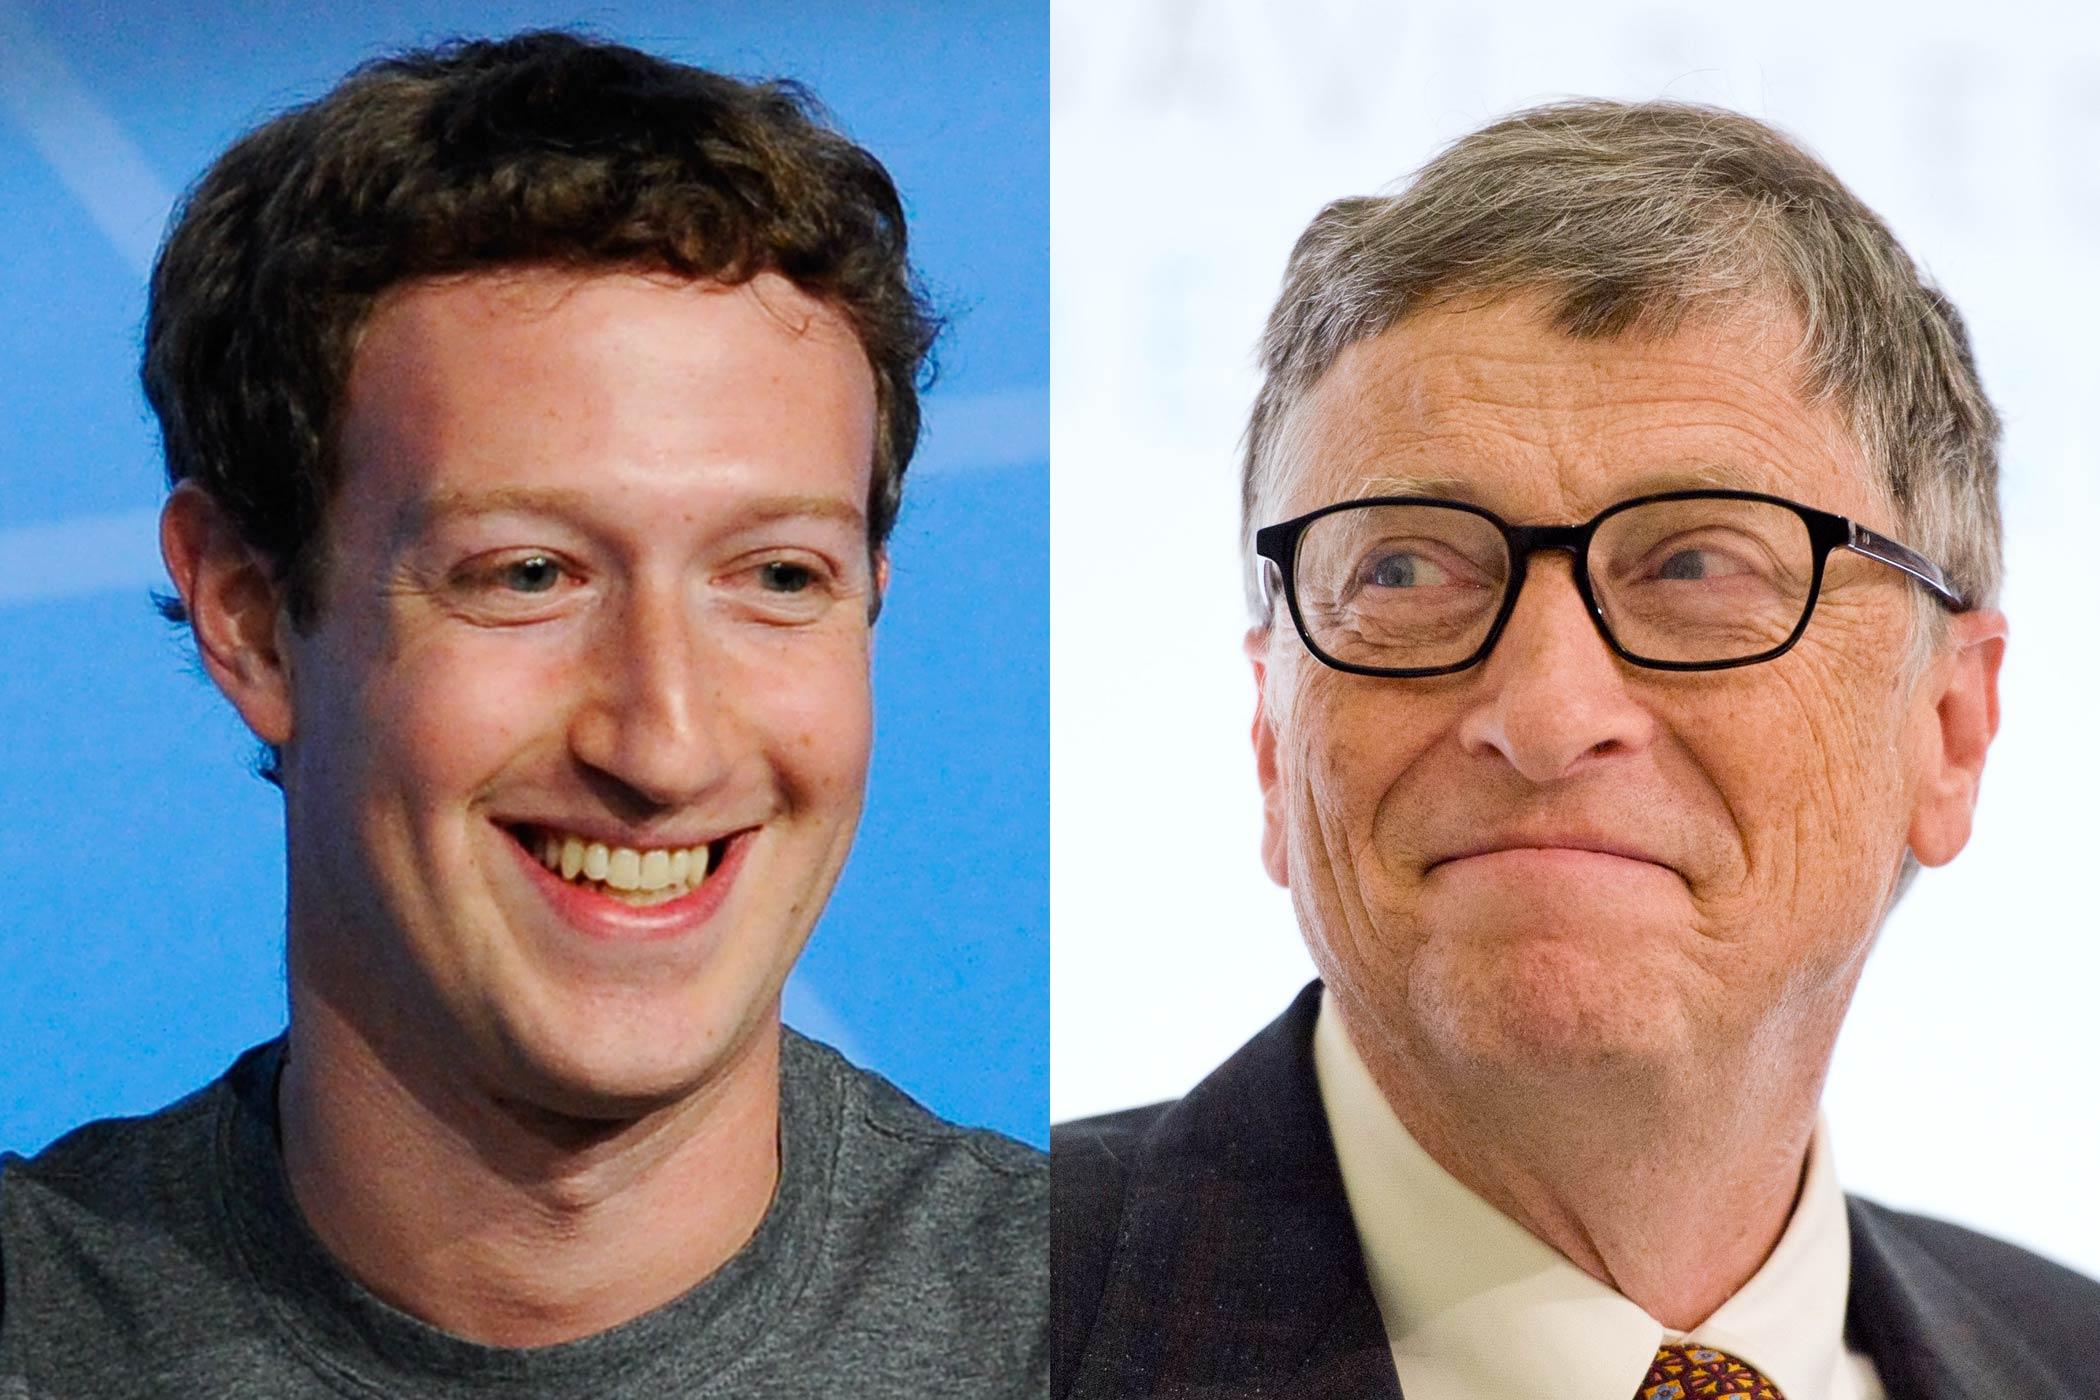 Bill Gates Talks About Facebook CEO Mark Zuckerberg on Reddit AMA ...